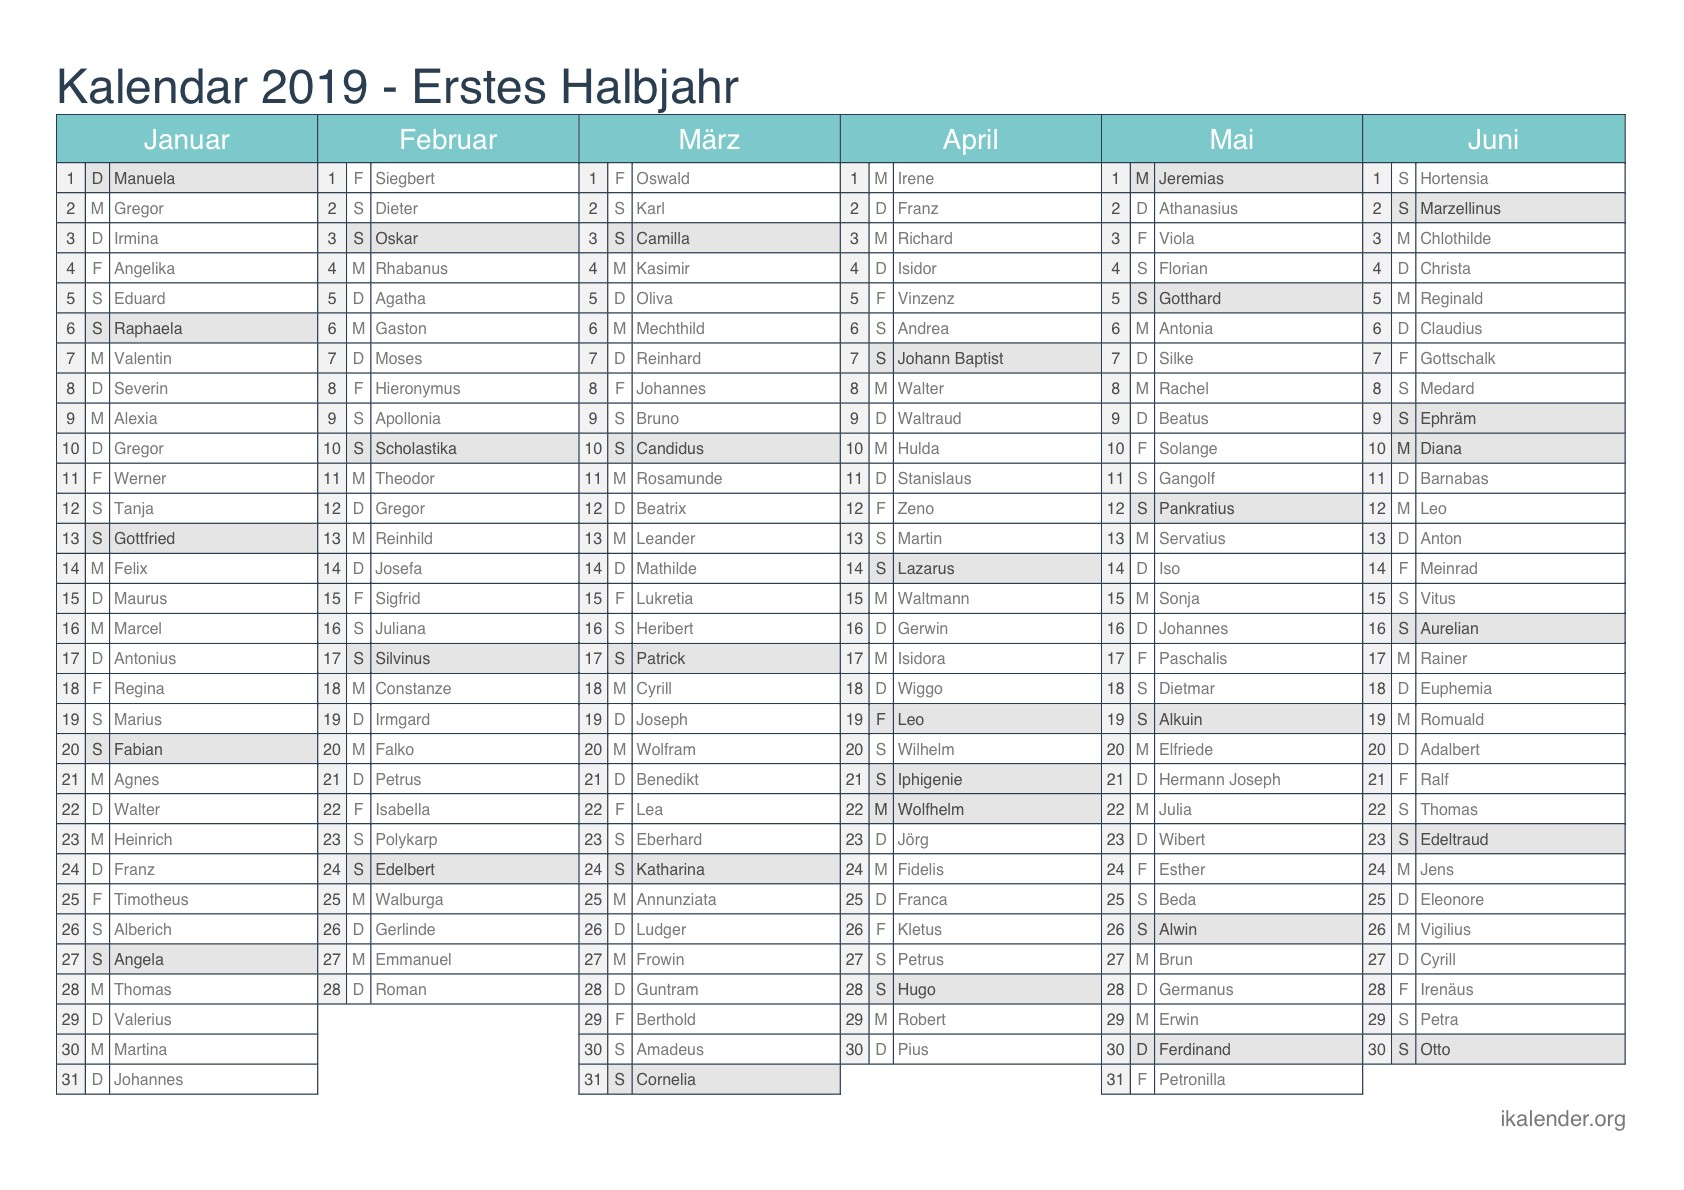 Kalender 2019 Zum Ausdrucken Ikalender Org